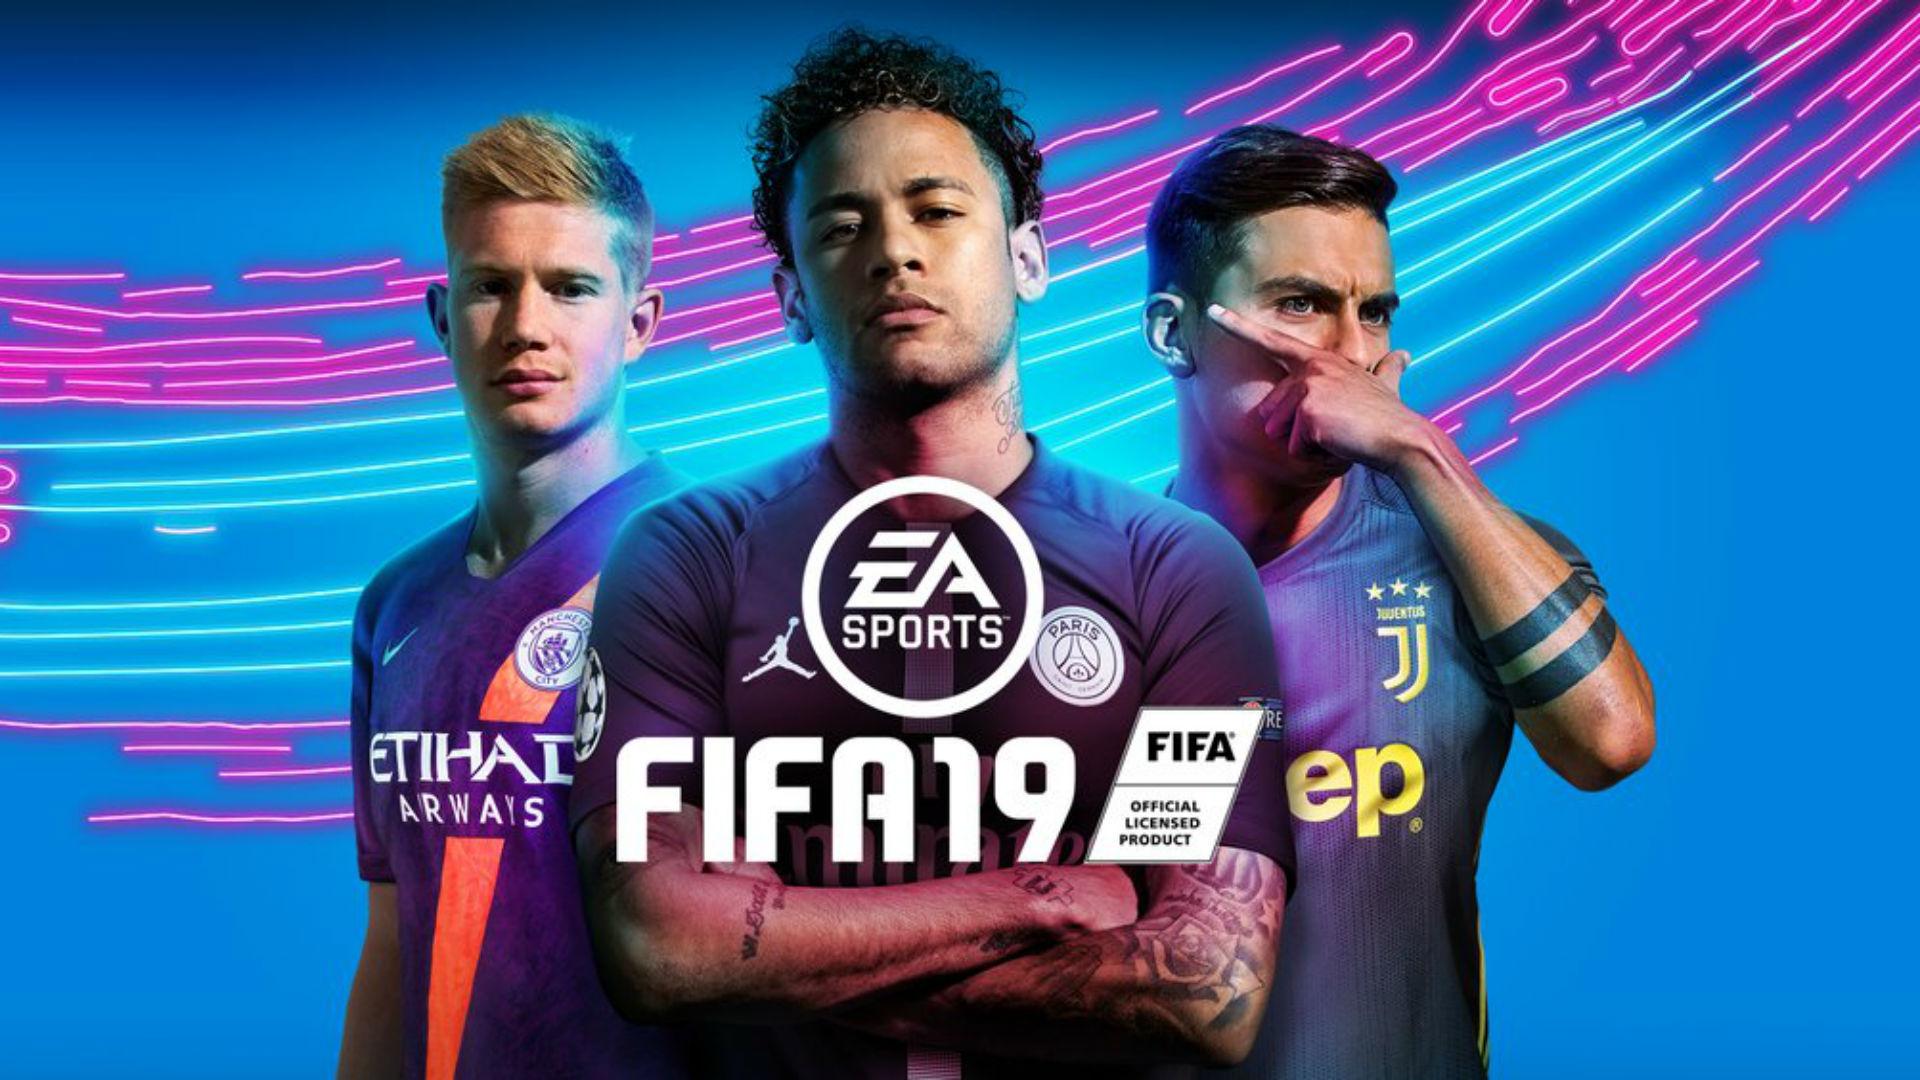 FIFA 19 cover Kevin De Bruyne Neymar Paulo Dybala